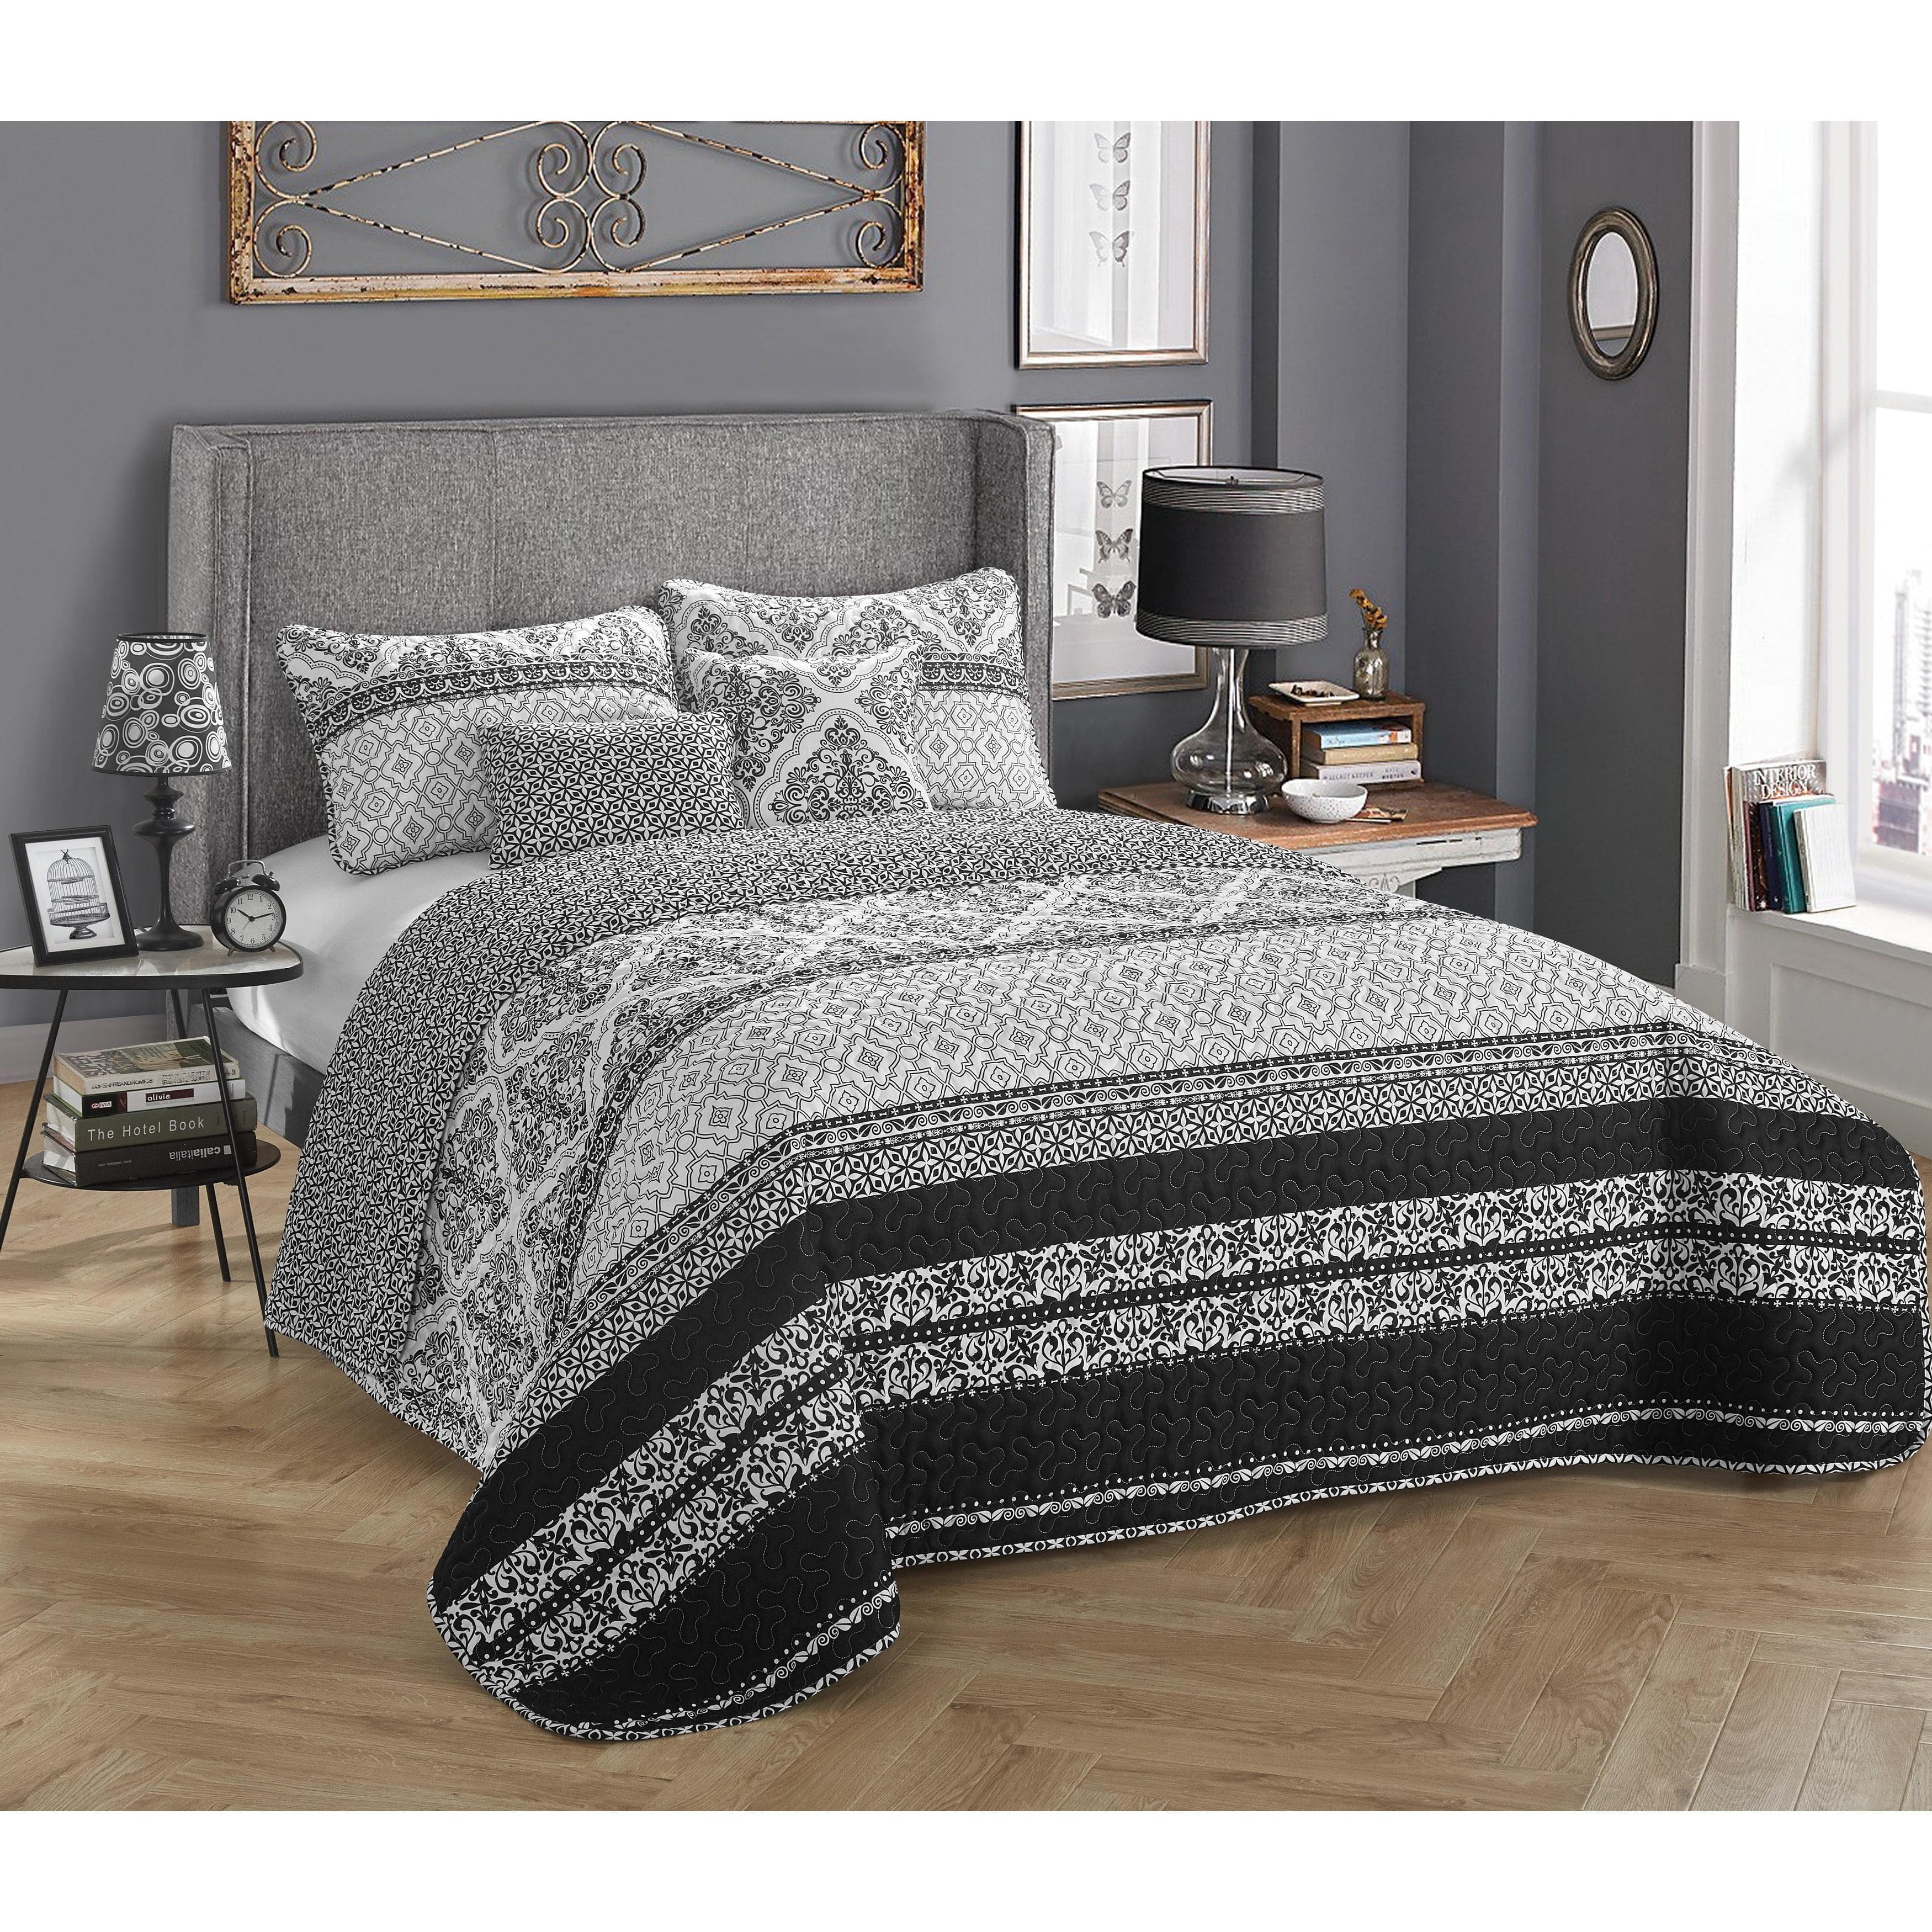 StyleNest Talulah 5-Piece Bedding Quilt Set by Idea Nuova